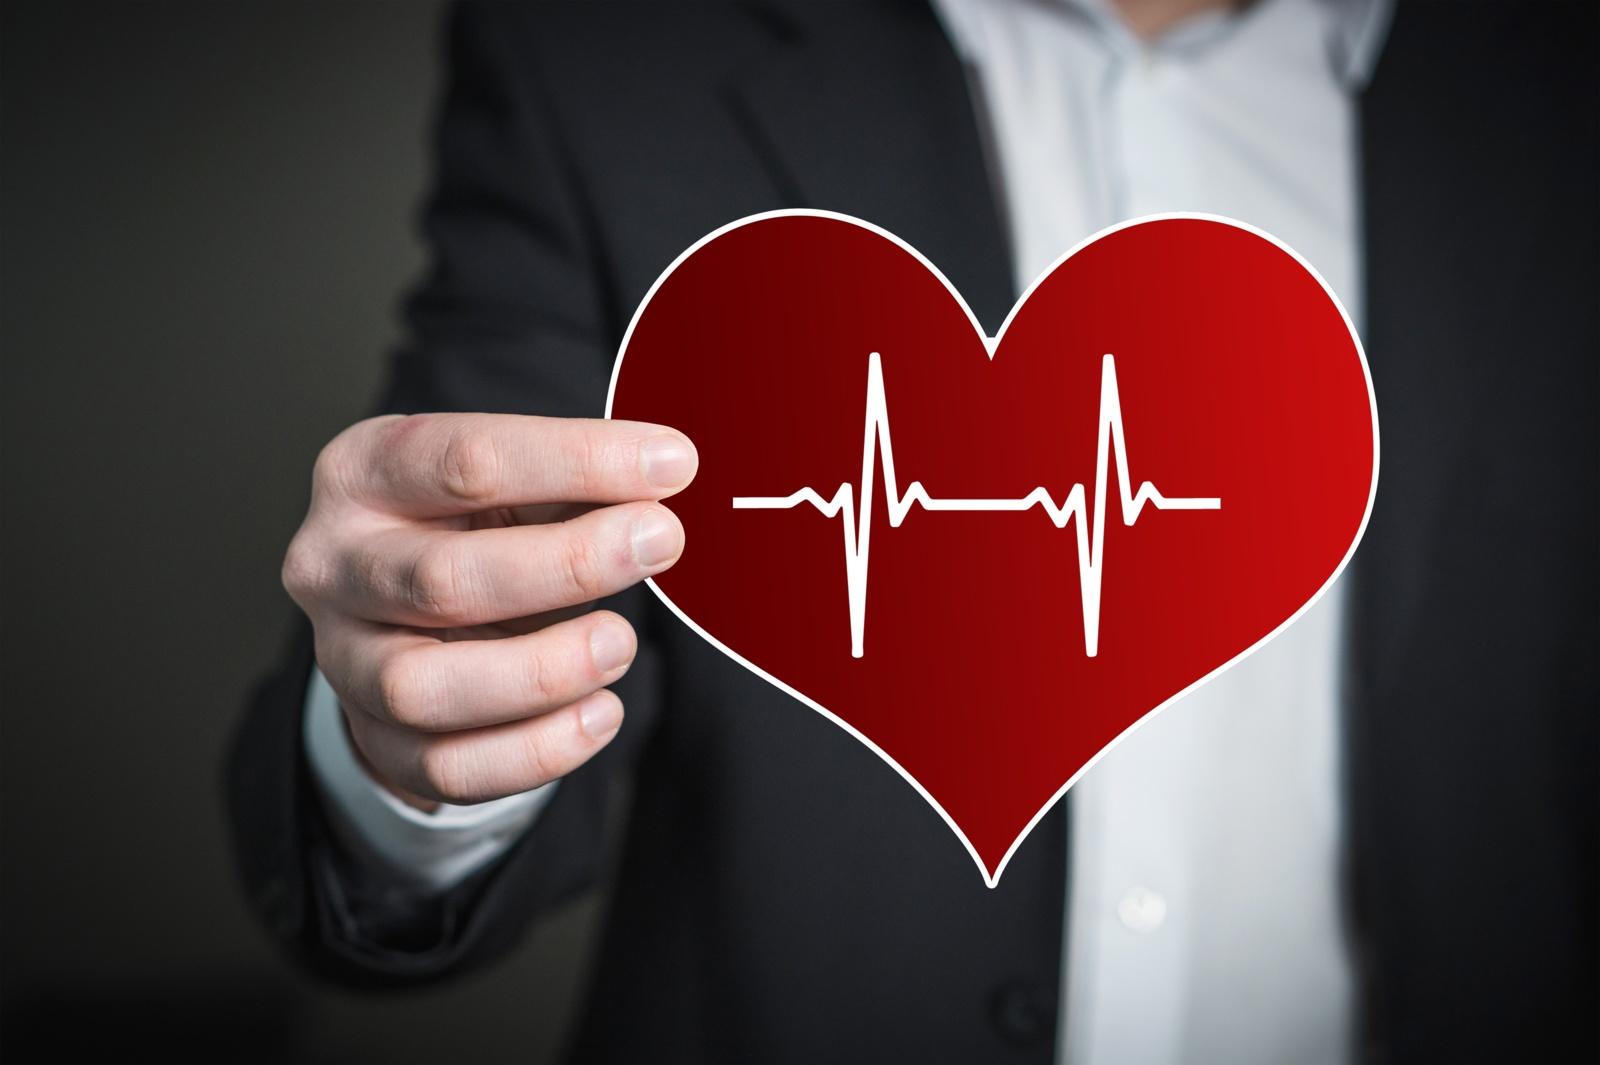 hipertenzinė krizė gydant hipertenziją